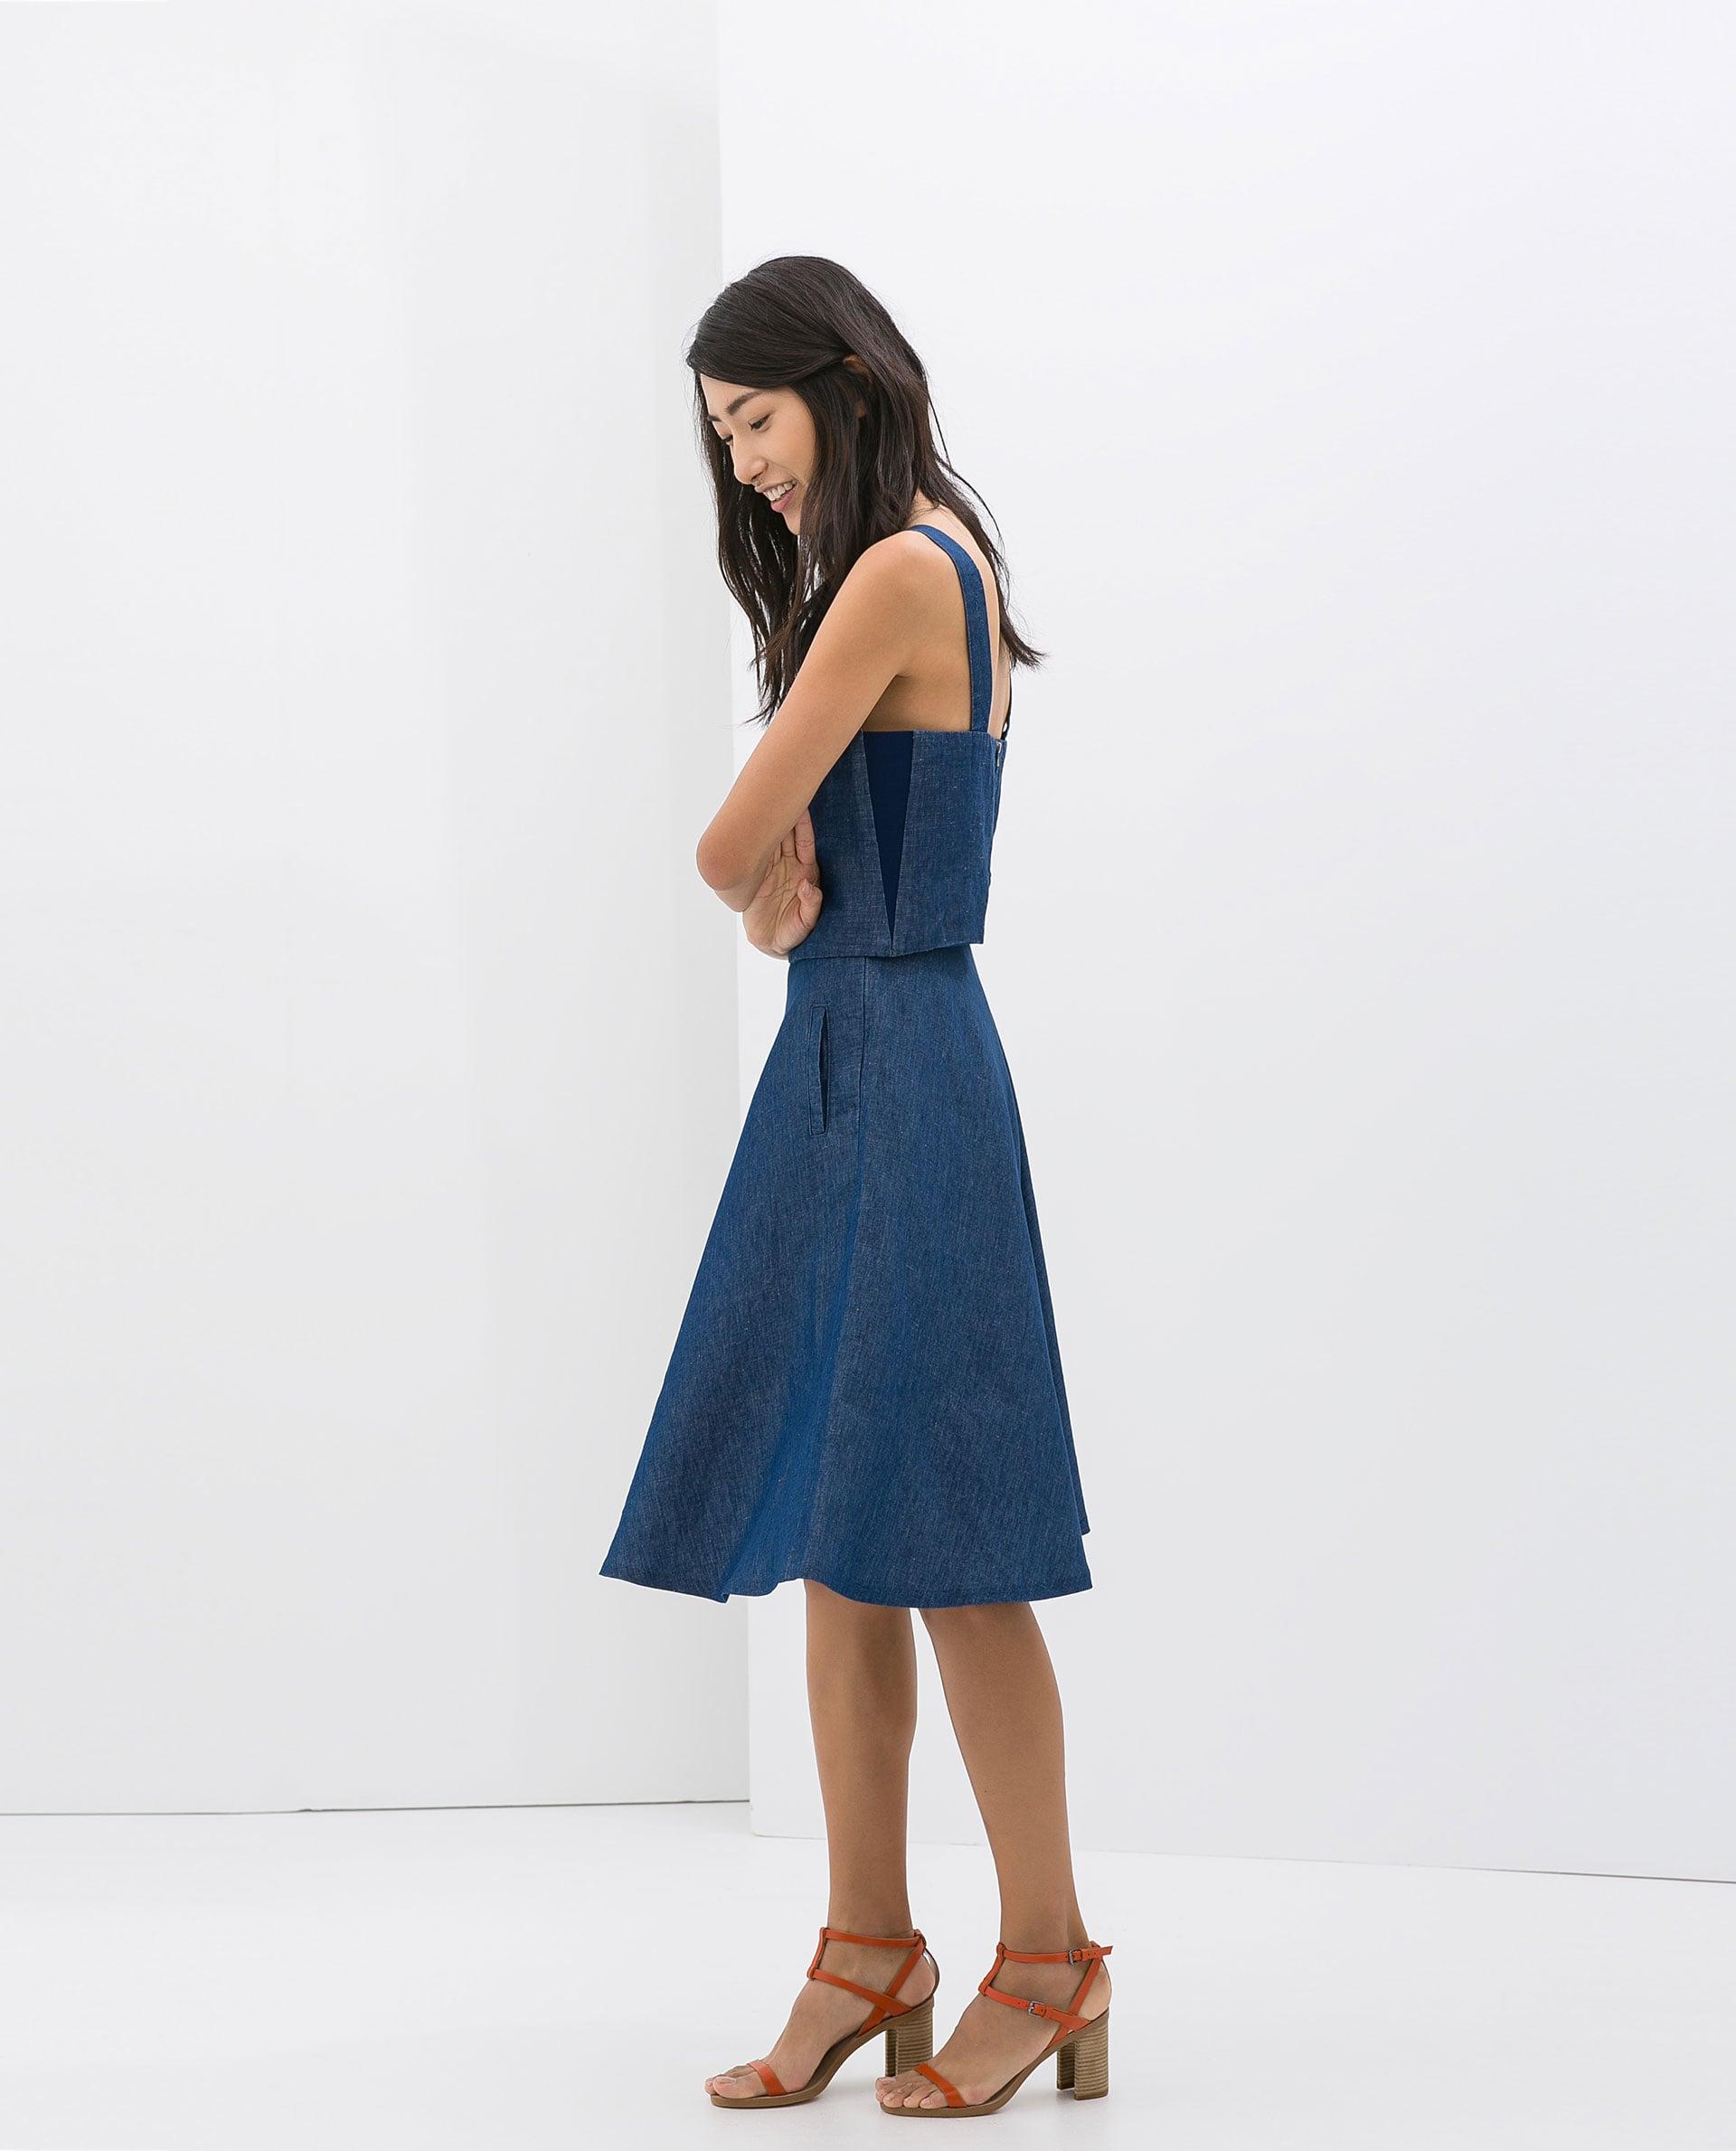 Zara Sleeveless Denim Top ($30) and Denim Midiskirt ($50)